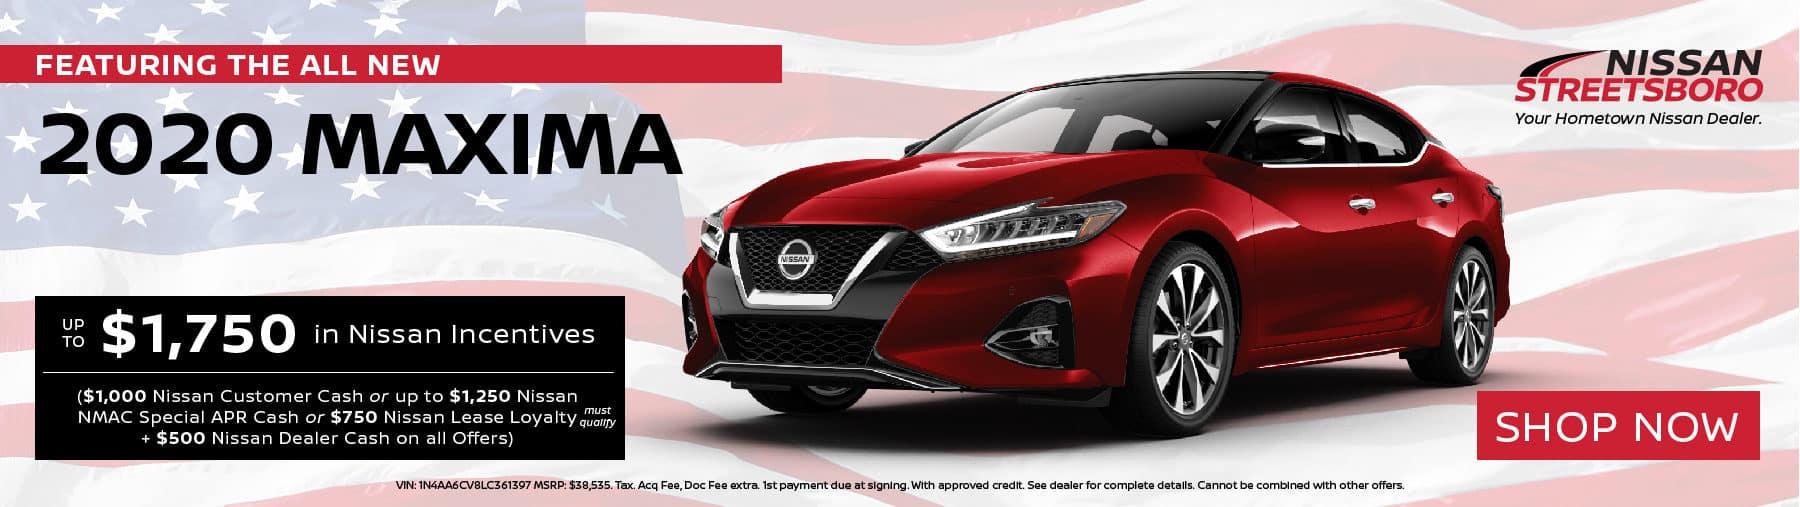 2020 Nissan Maxima Incentives